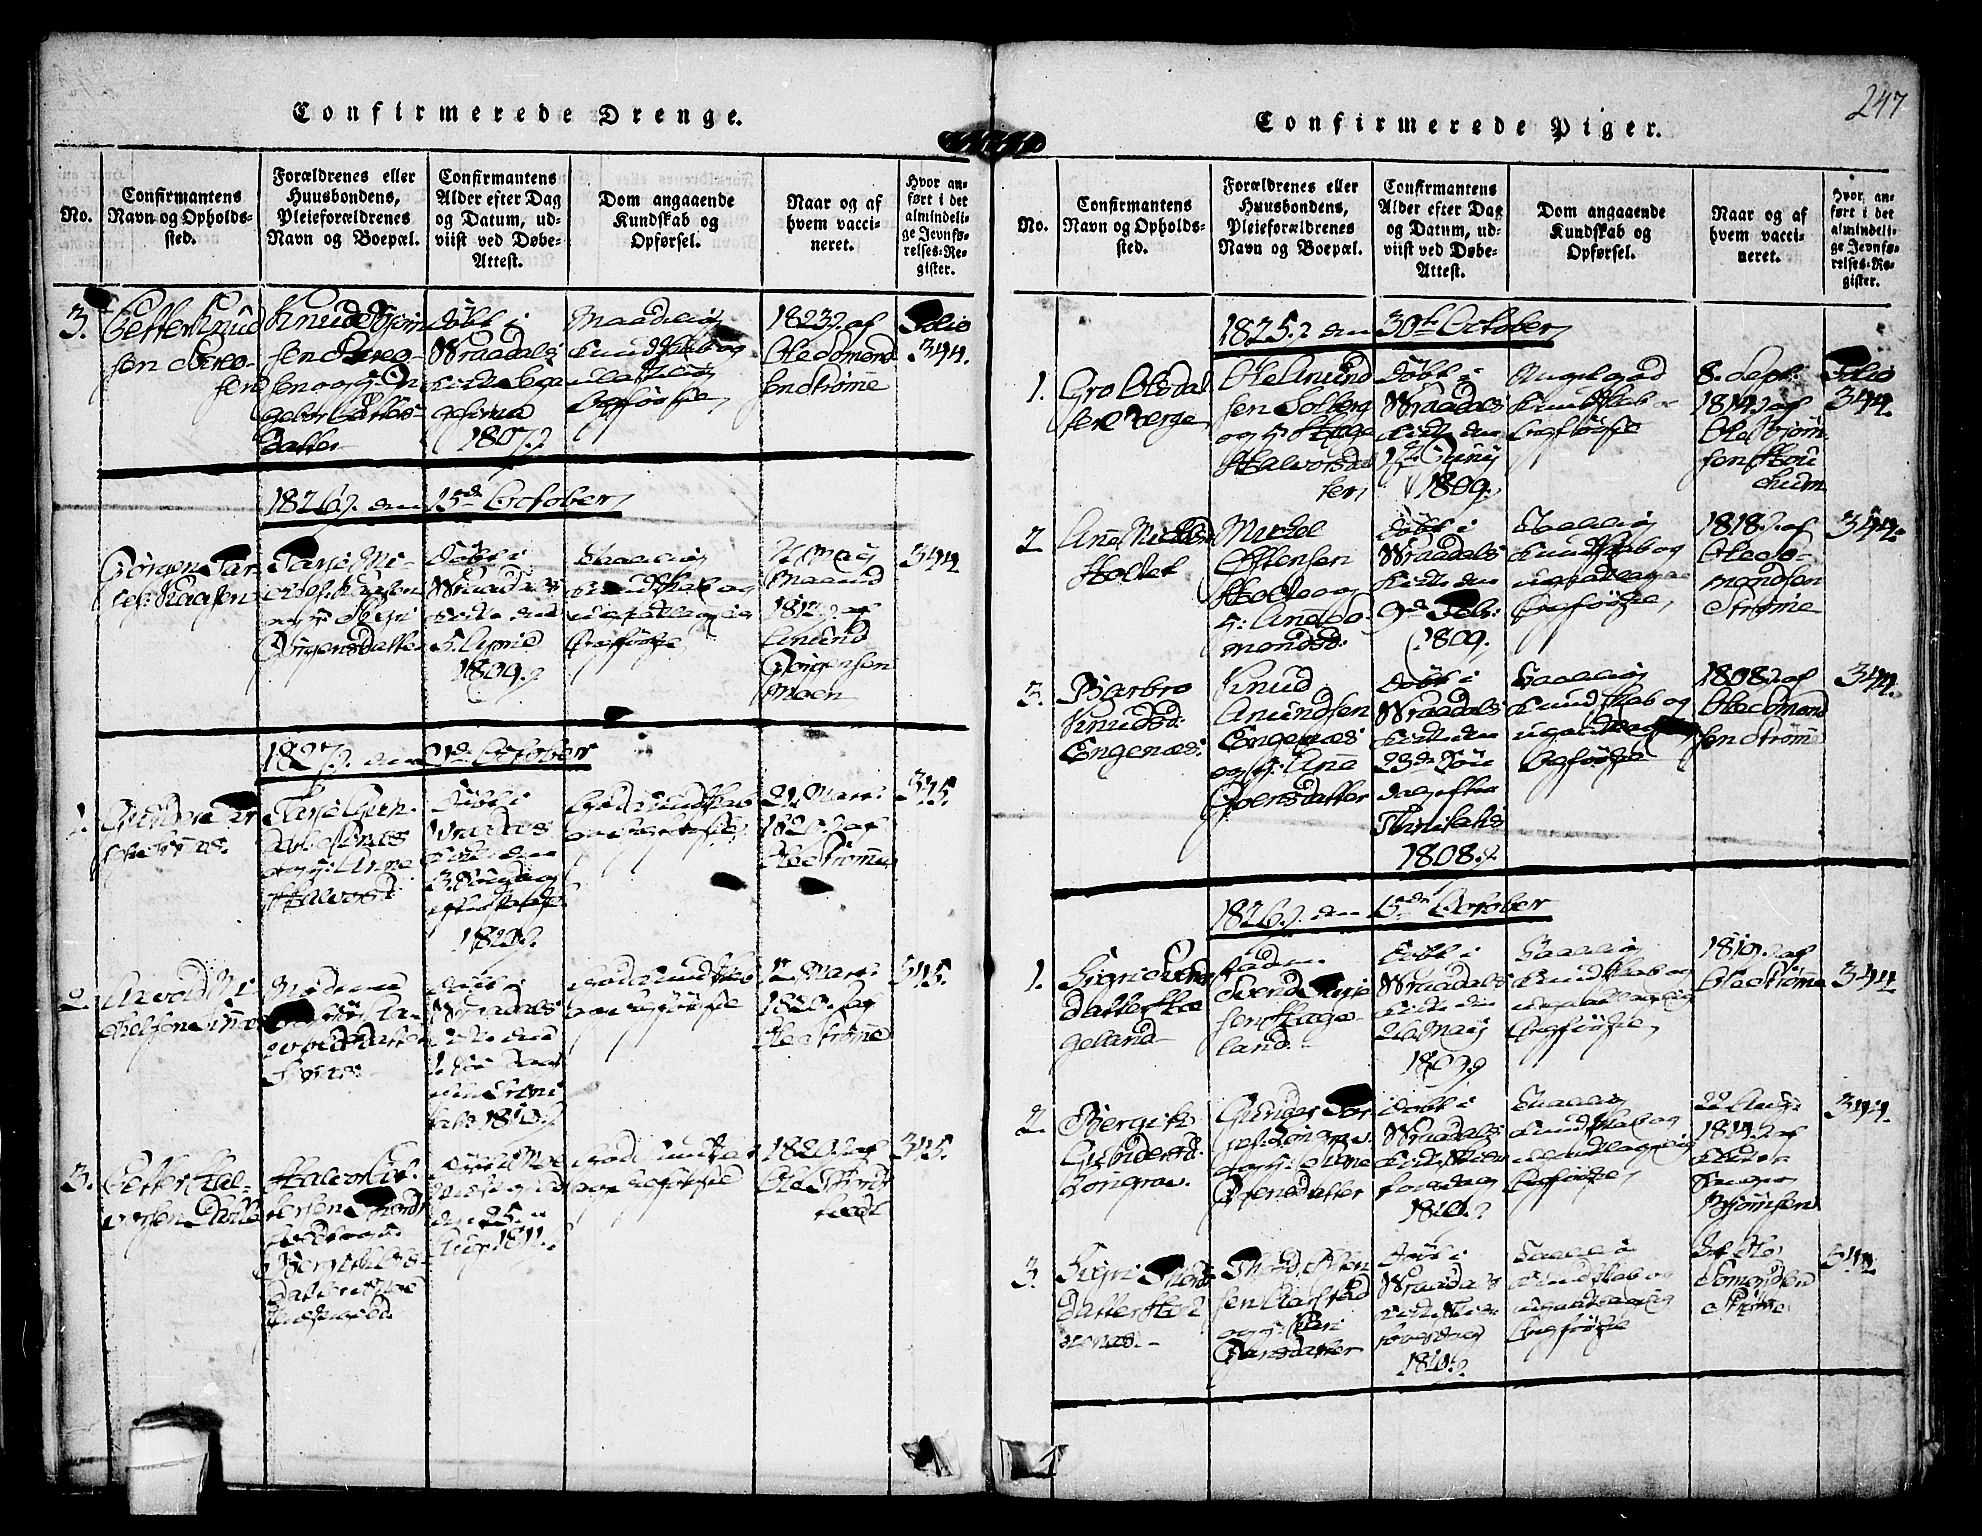 SAKO, Kviteseid kirkebøker, F/Fc/L0001: Ministerialbok nr. III 1, 1815-1836, s. 247